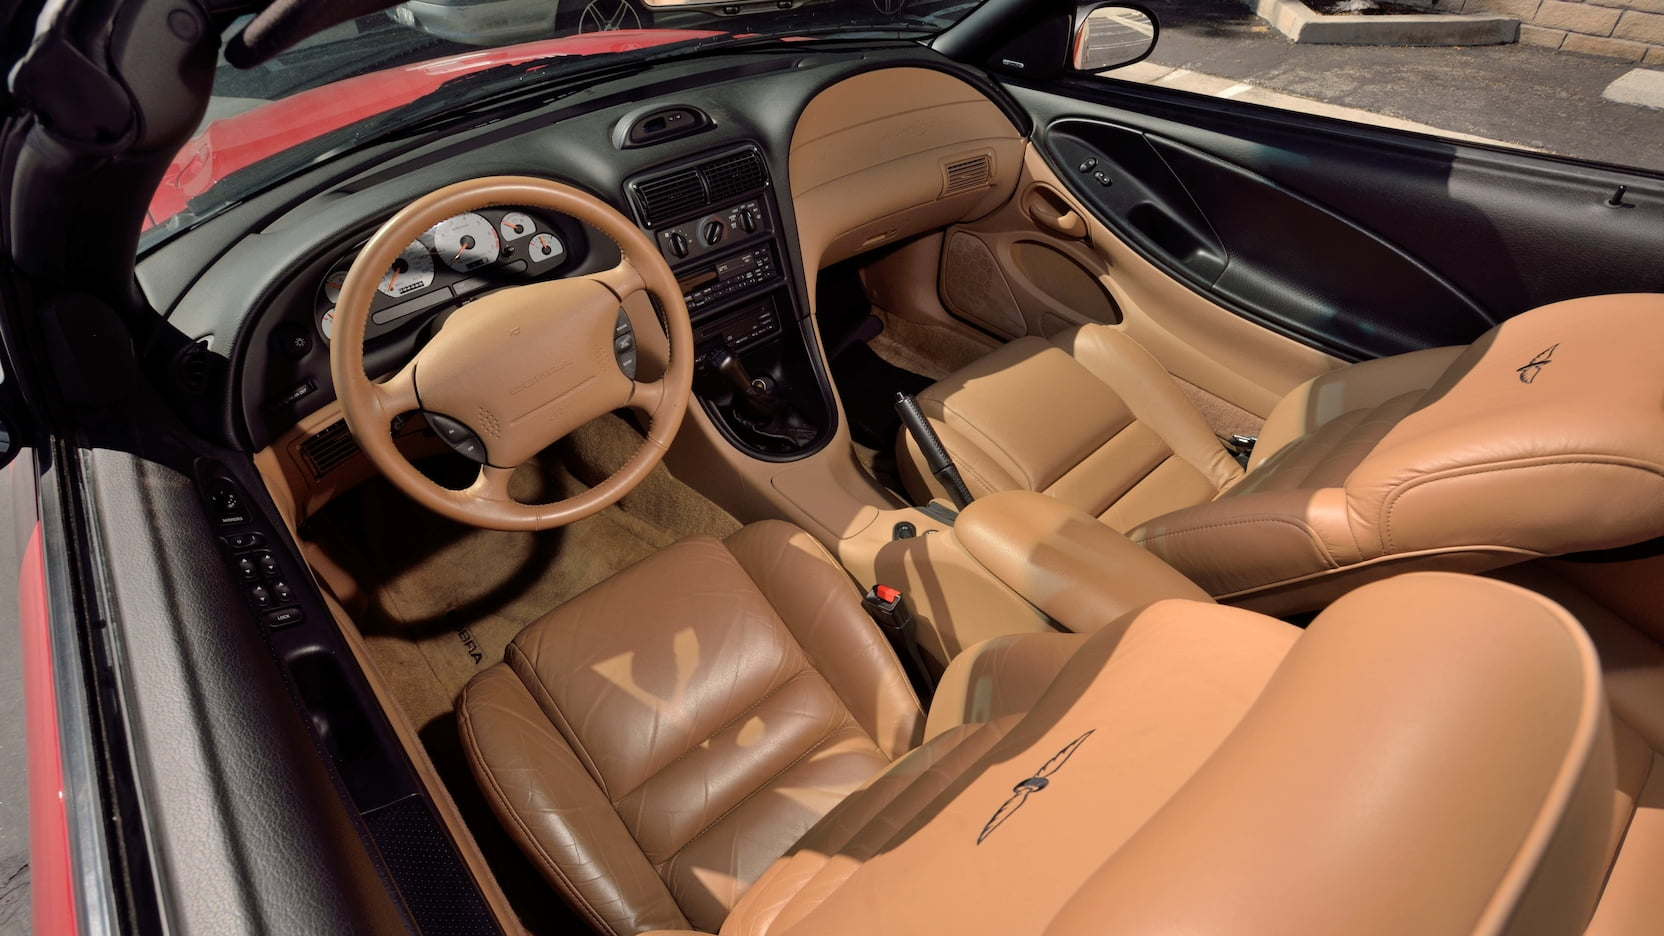 1994 Ford Mustang SVT Cobra Pace Car Edition interior Parnelli Jones Mecum